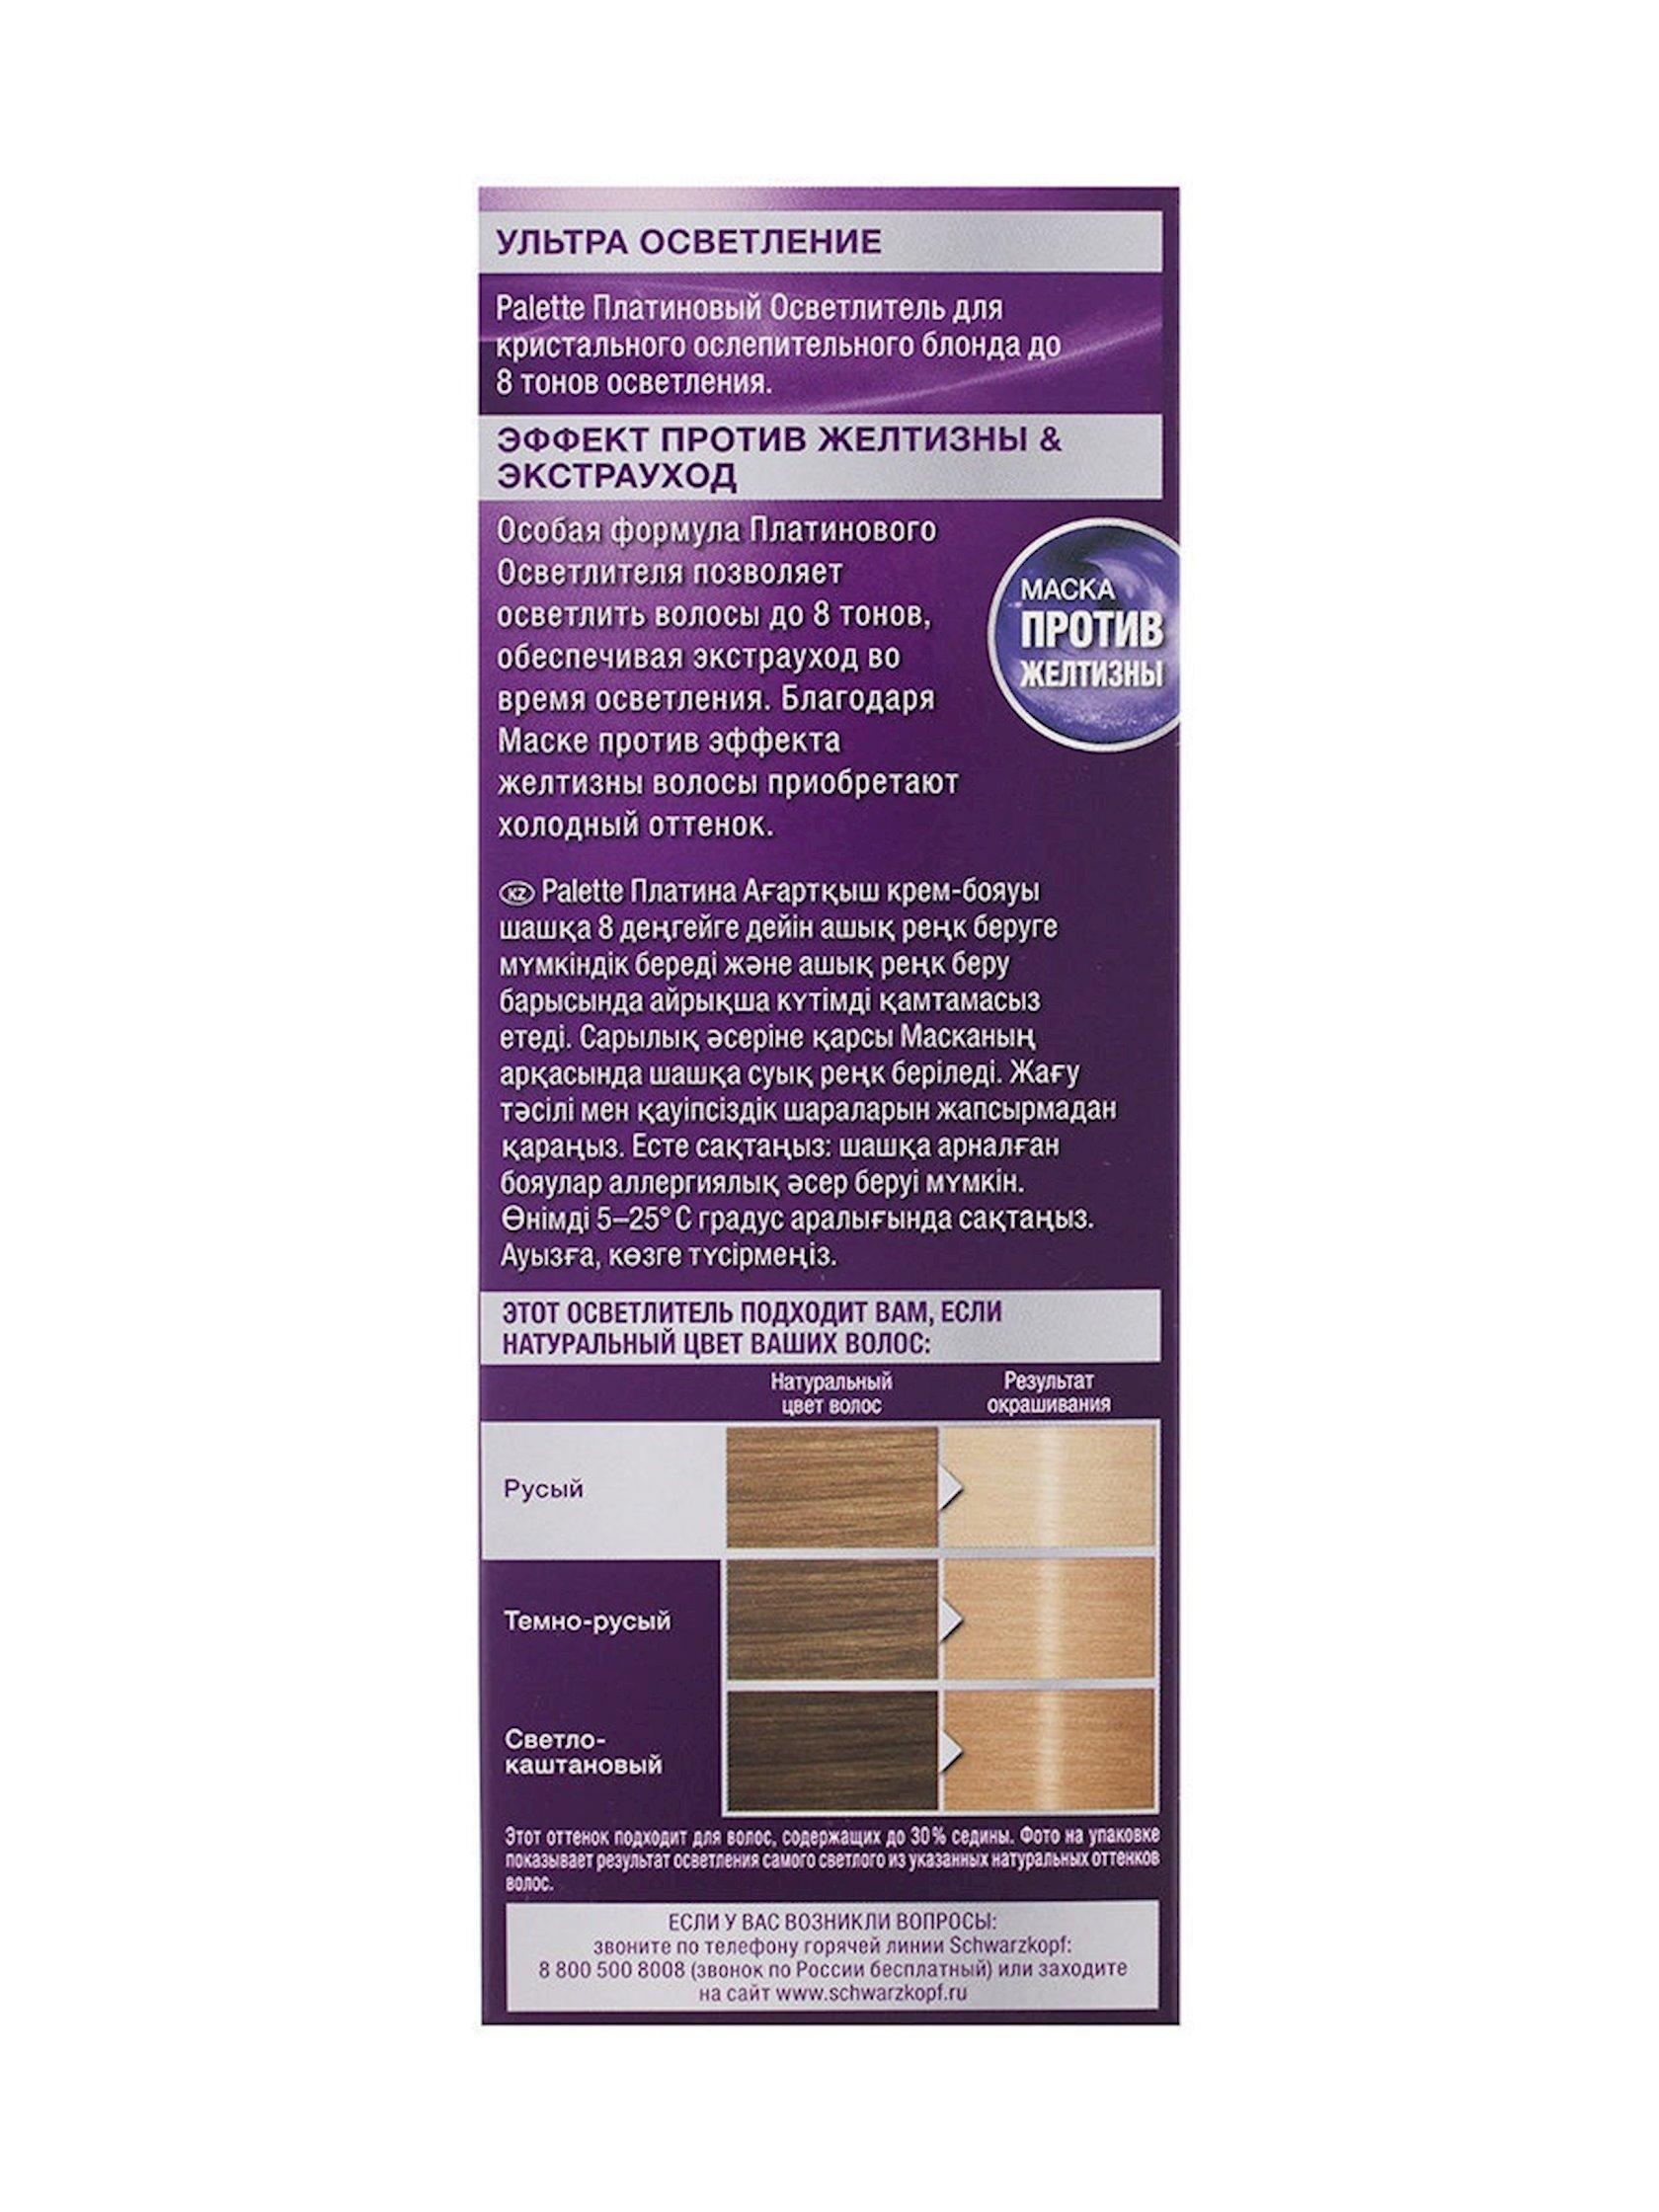 Davamlı krem-boya Palette Intensive Color, çalar PL0 Platin rəng açıcı, 110 ml